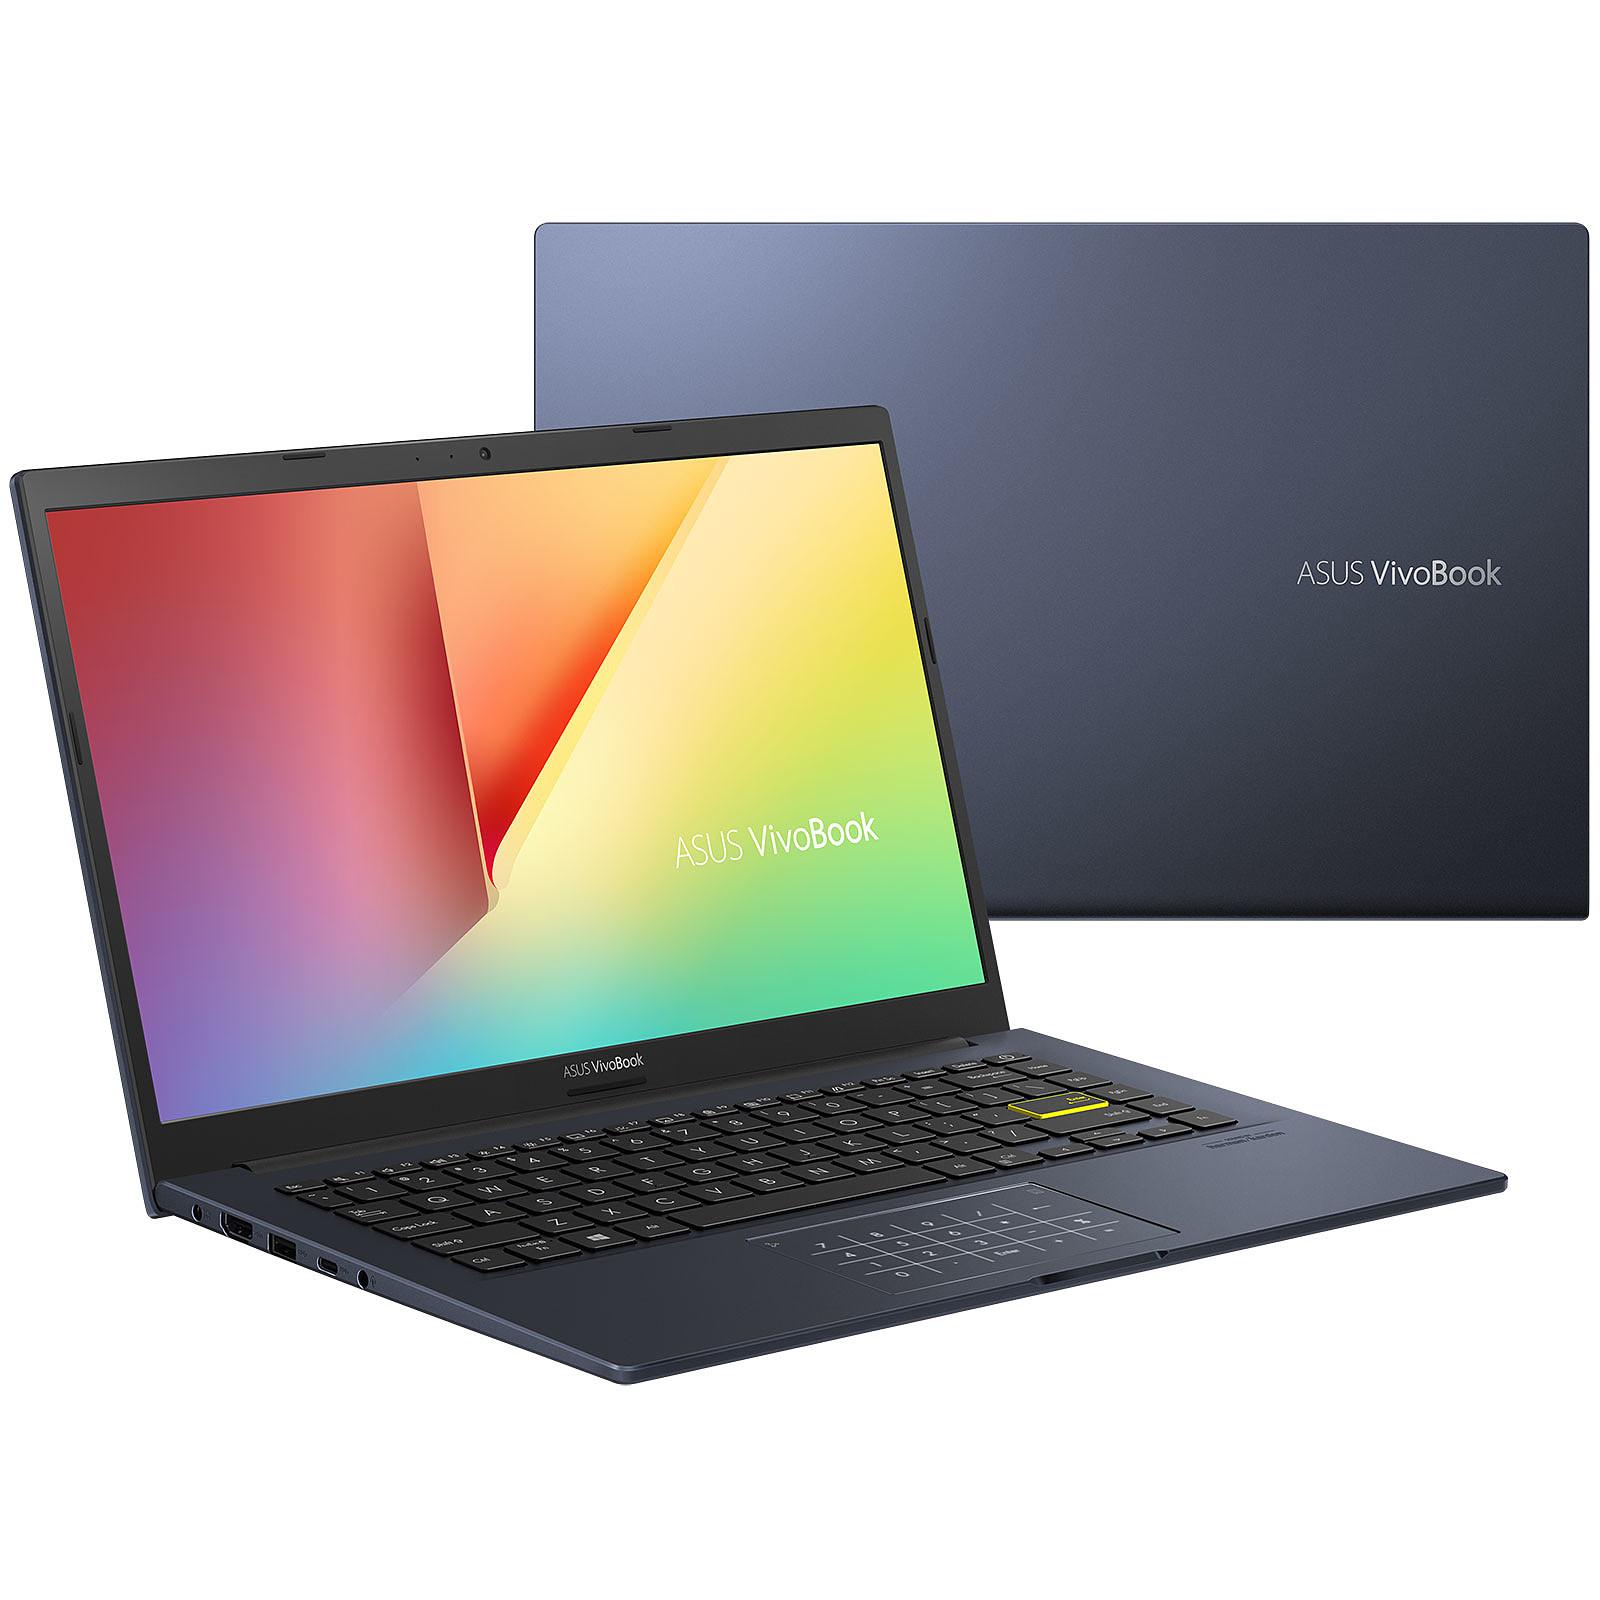 ASUS Vivobook S14 S413IA-EK615T avec NumPad